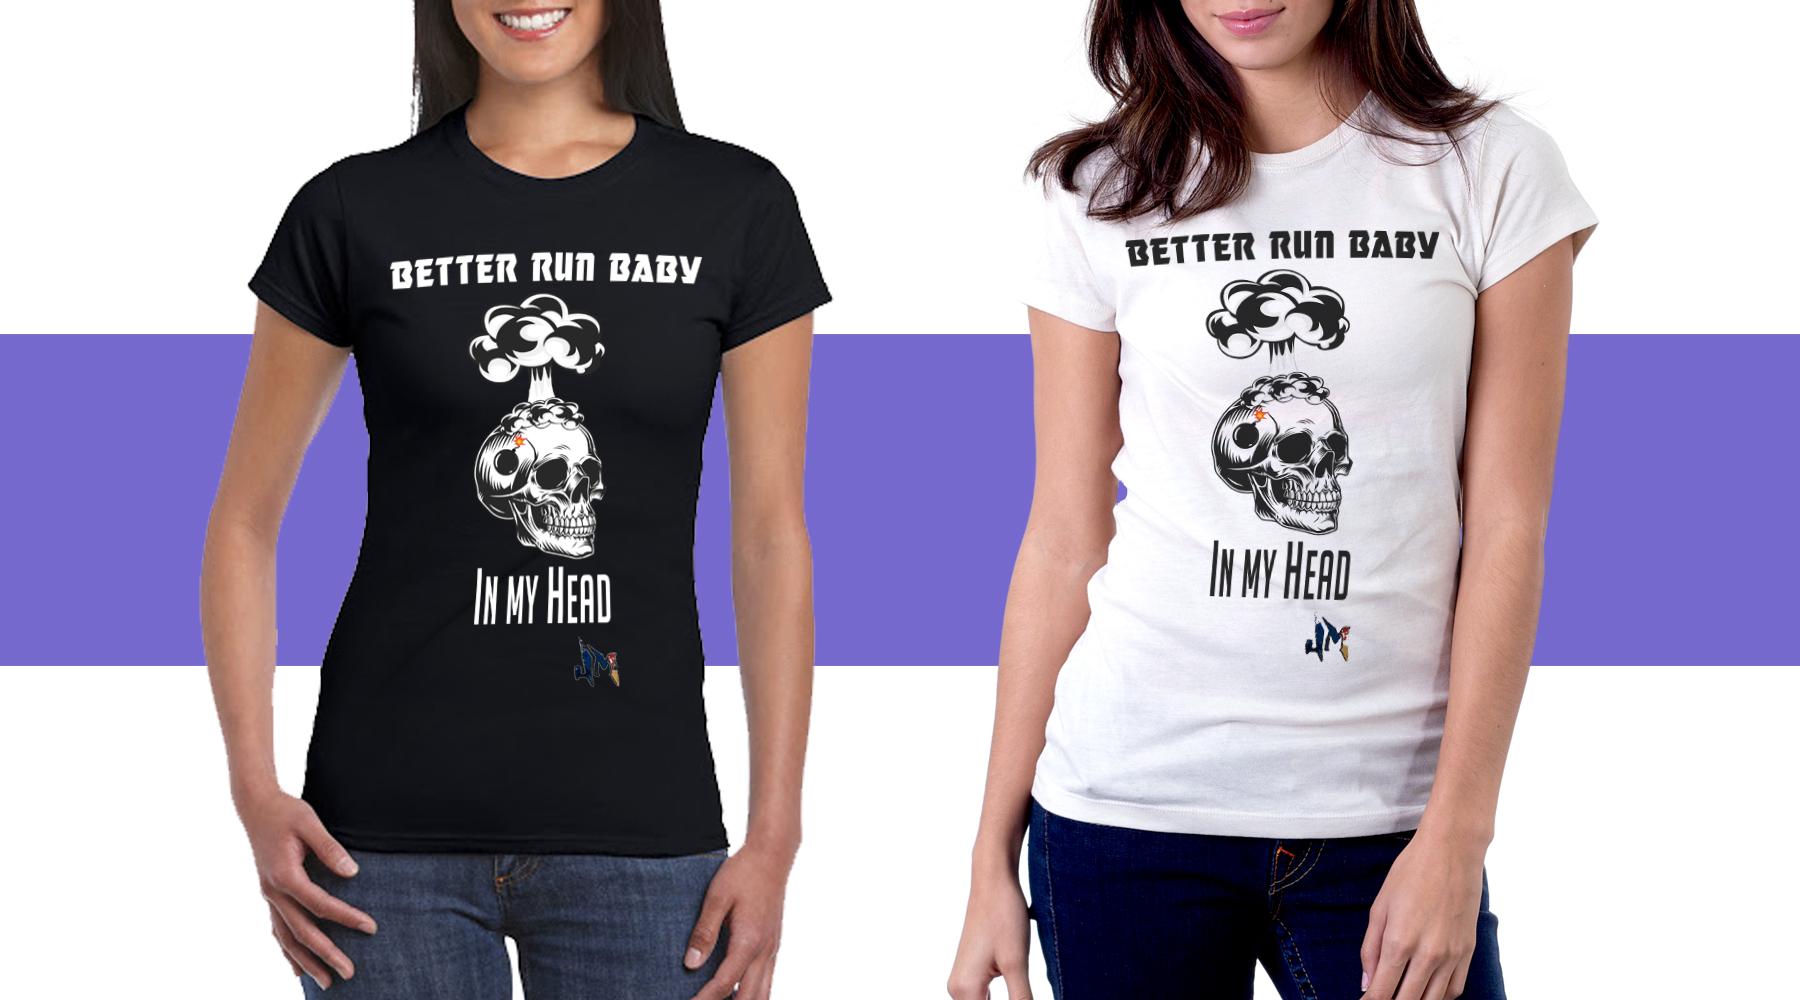 BetterRunBabyWomens